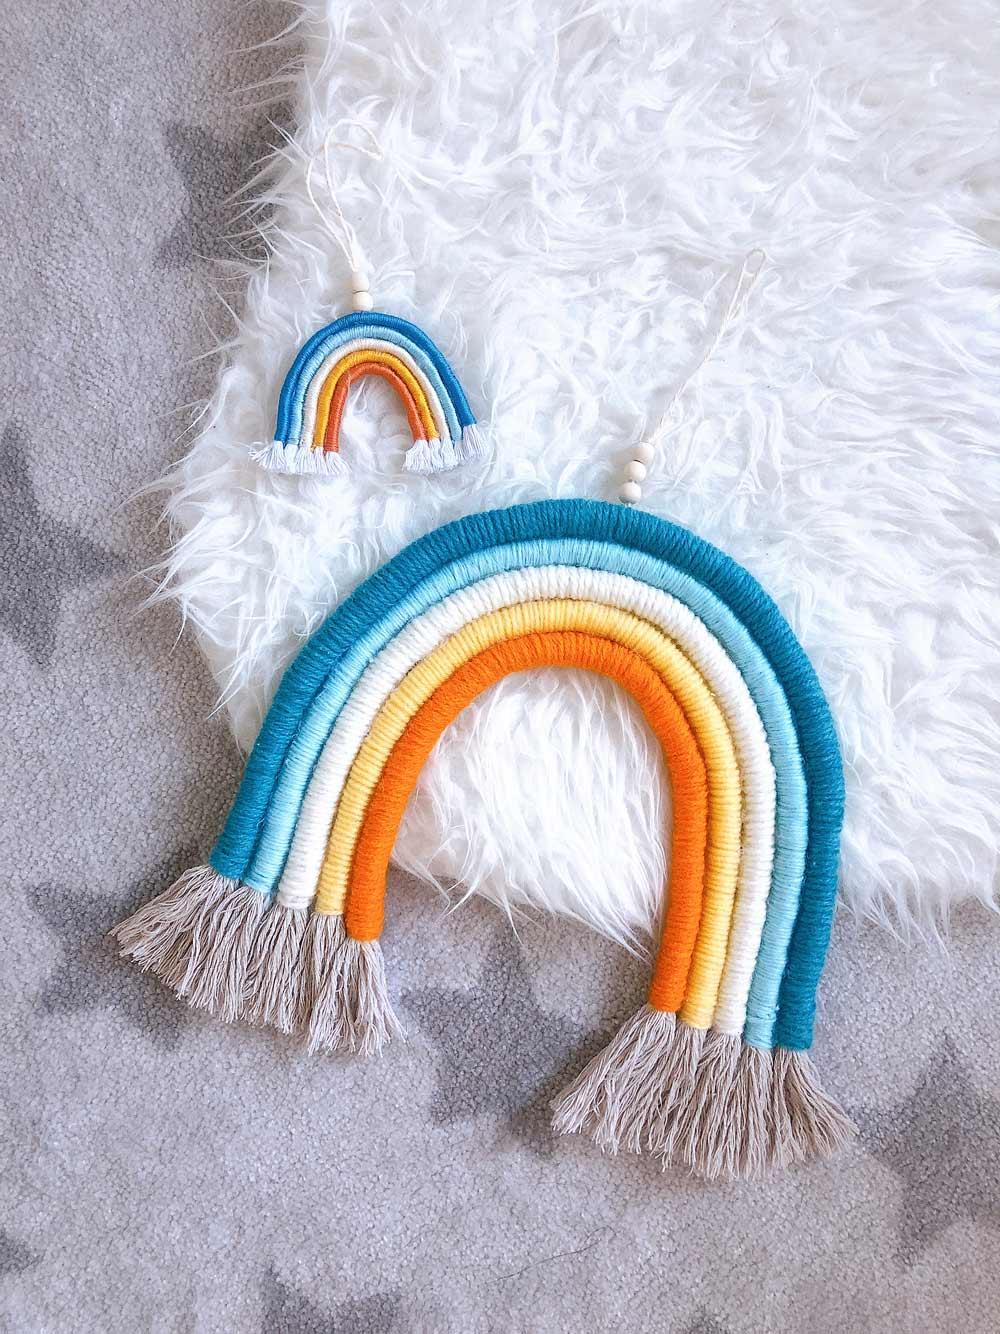 DIY Rainbow Wall Hanging Tutorial (with matching mini charm)